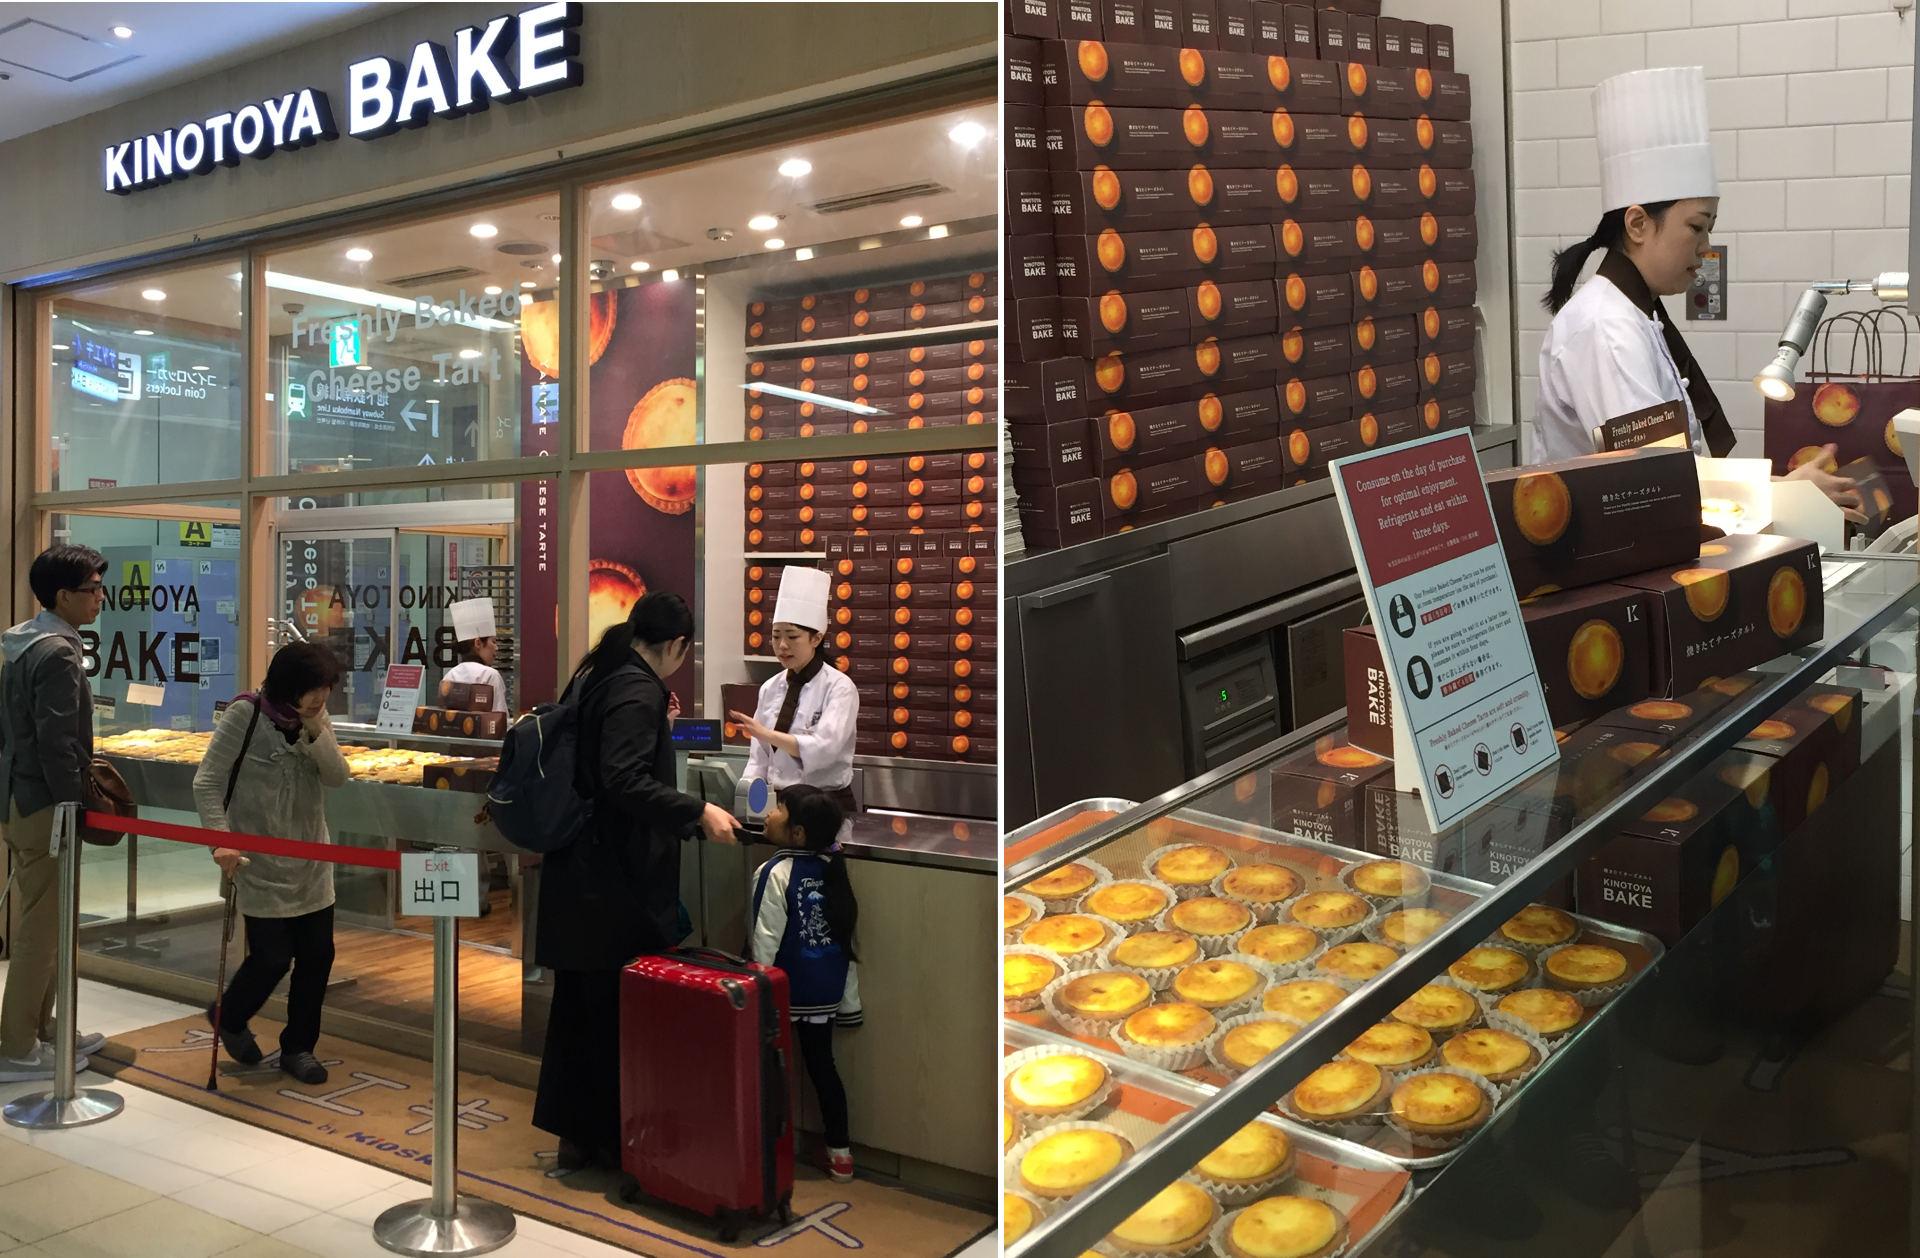 japonia japan kinotoya bake cheescake sernik z hokkaido iglawpodrozy